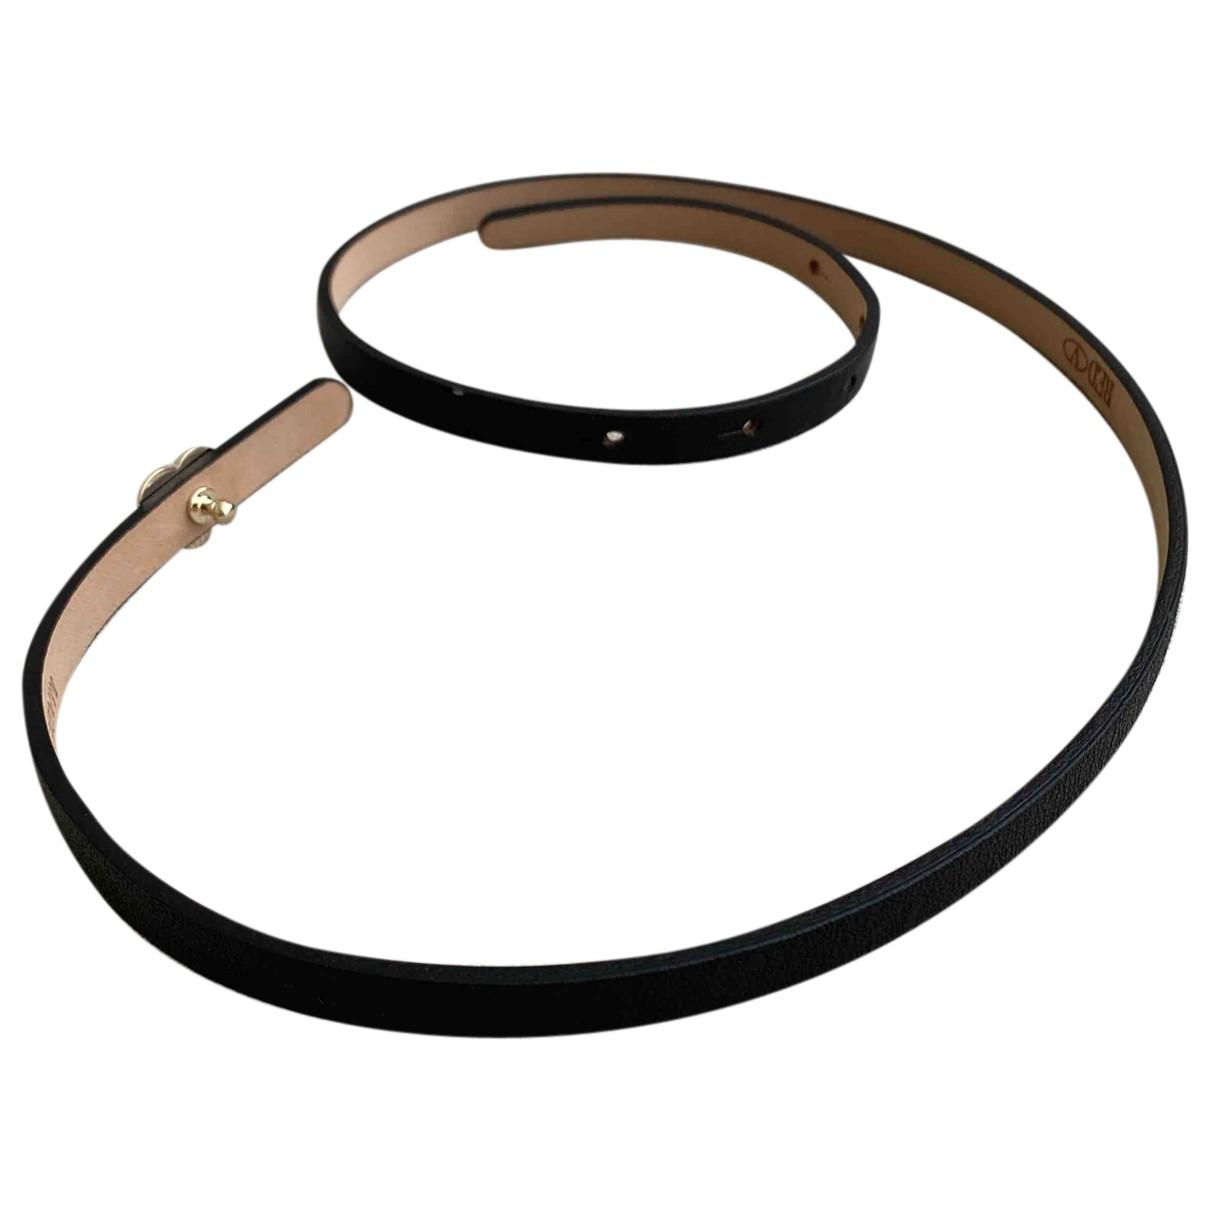 Red Valentino Garavani \N Black Leather belt for Women 70 cm